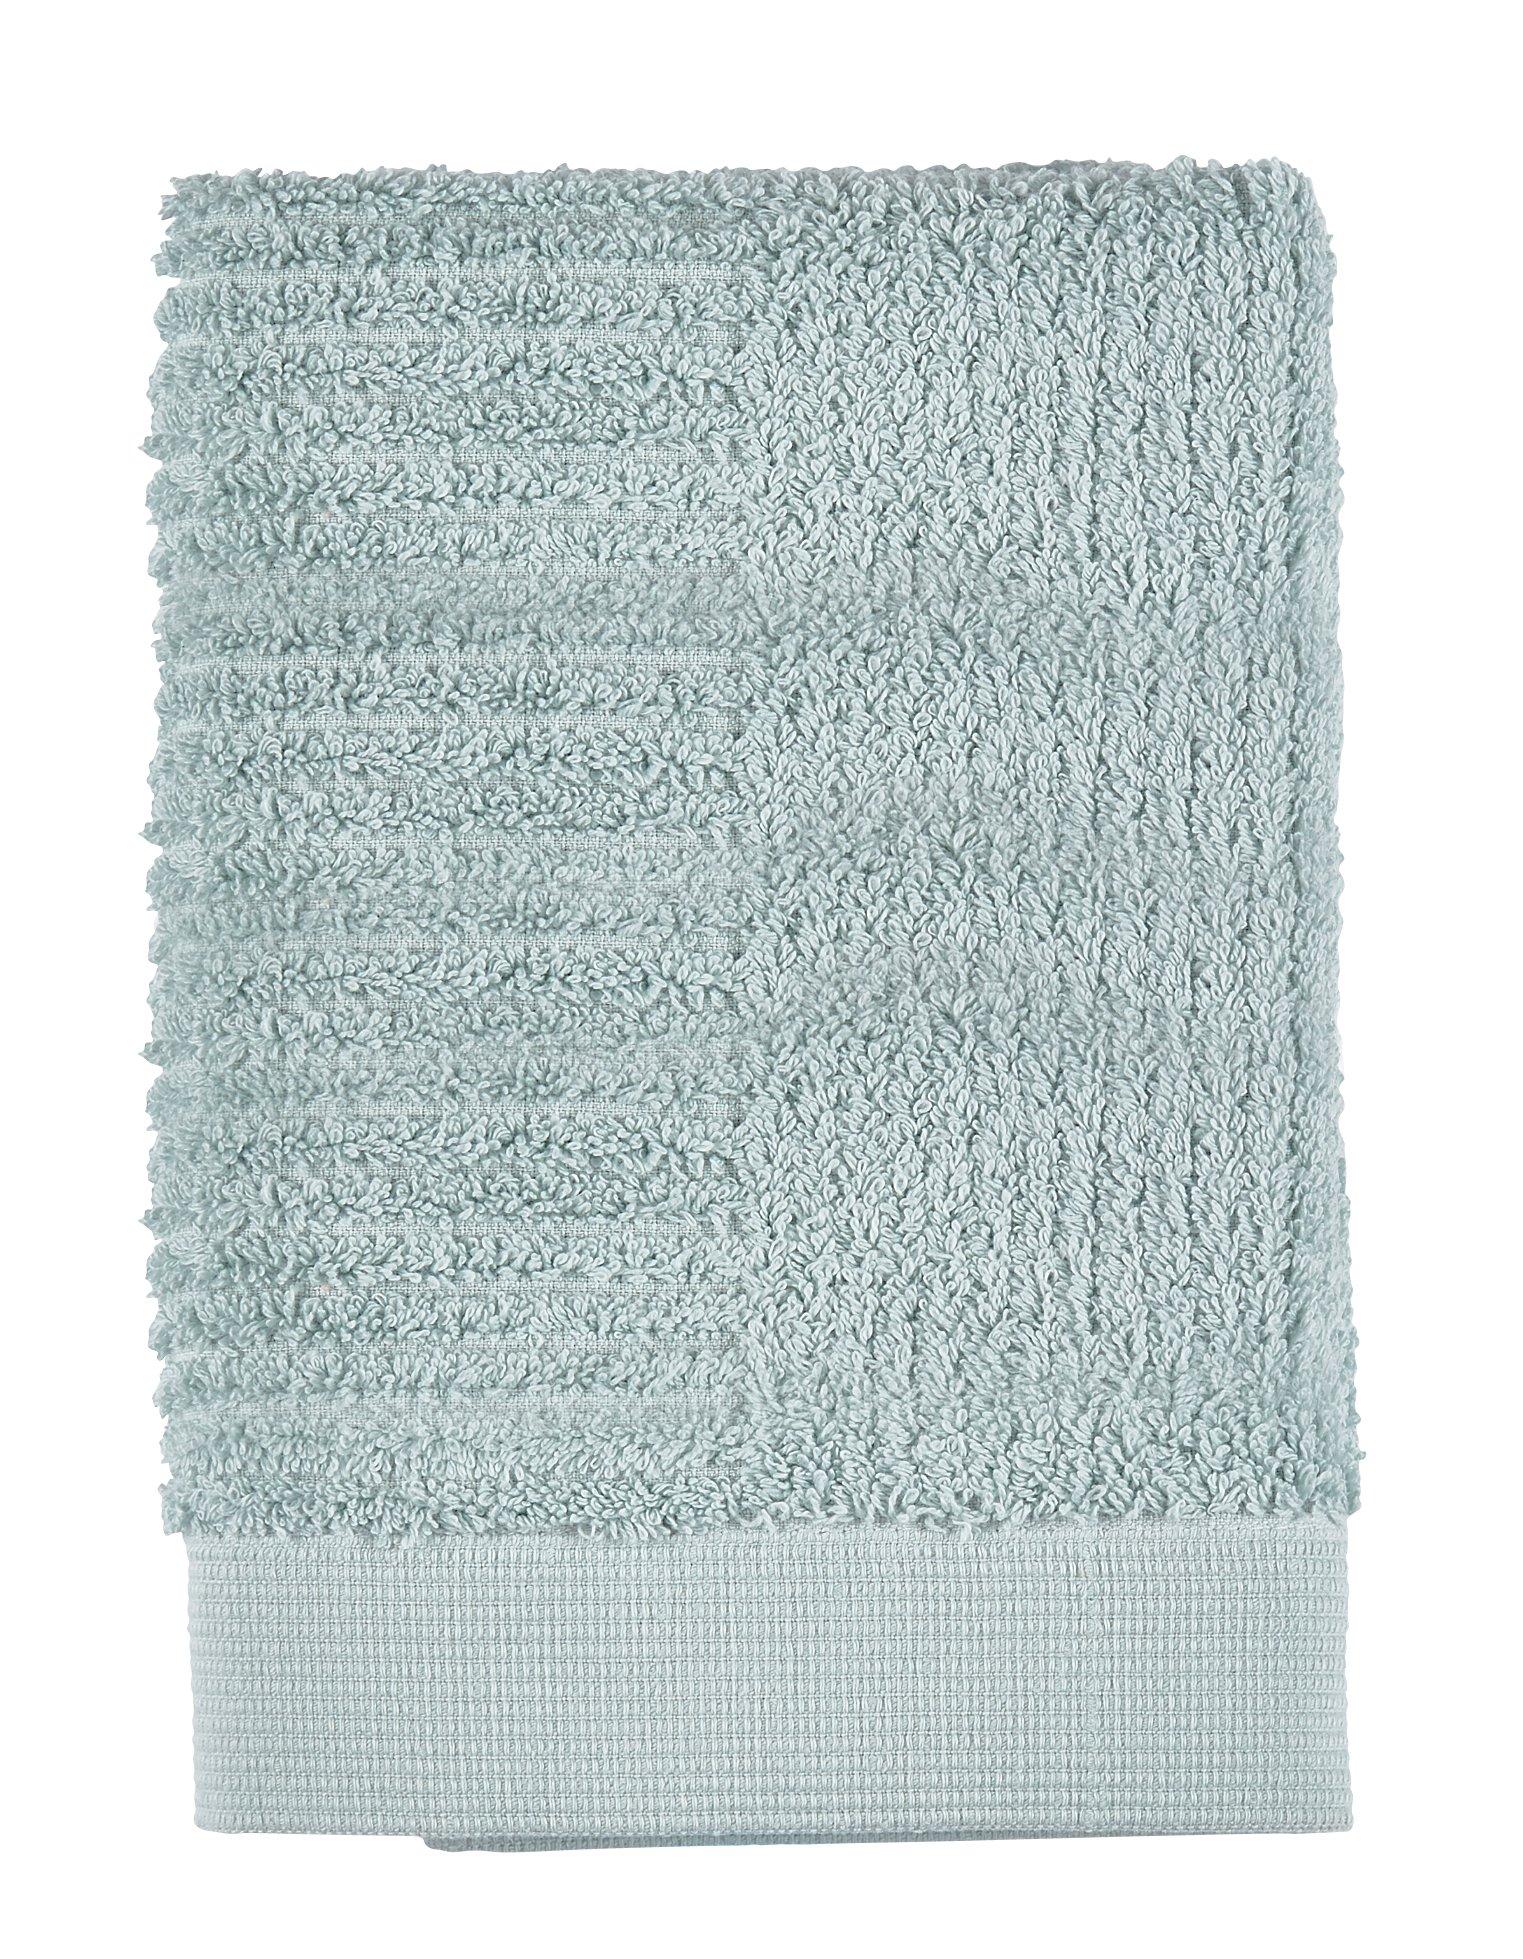 Zone - Classic Towel 50 x 70 cm - Dust Green (330112)